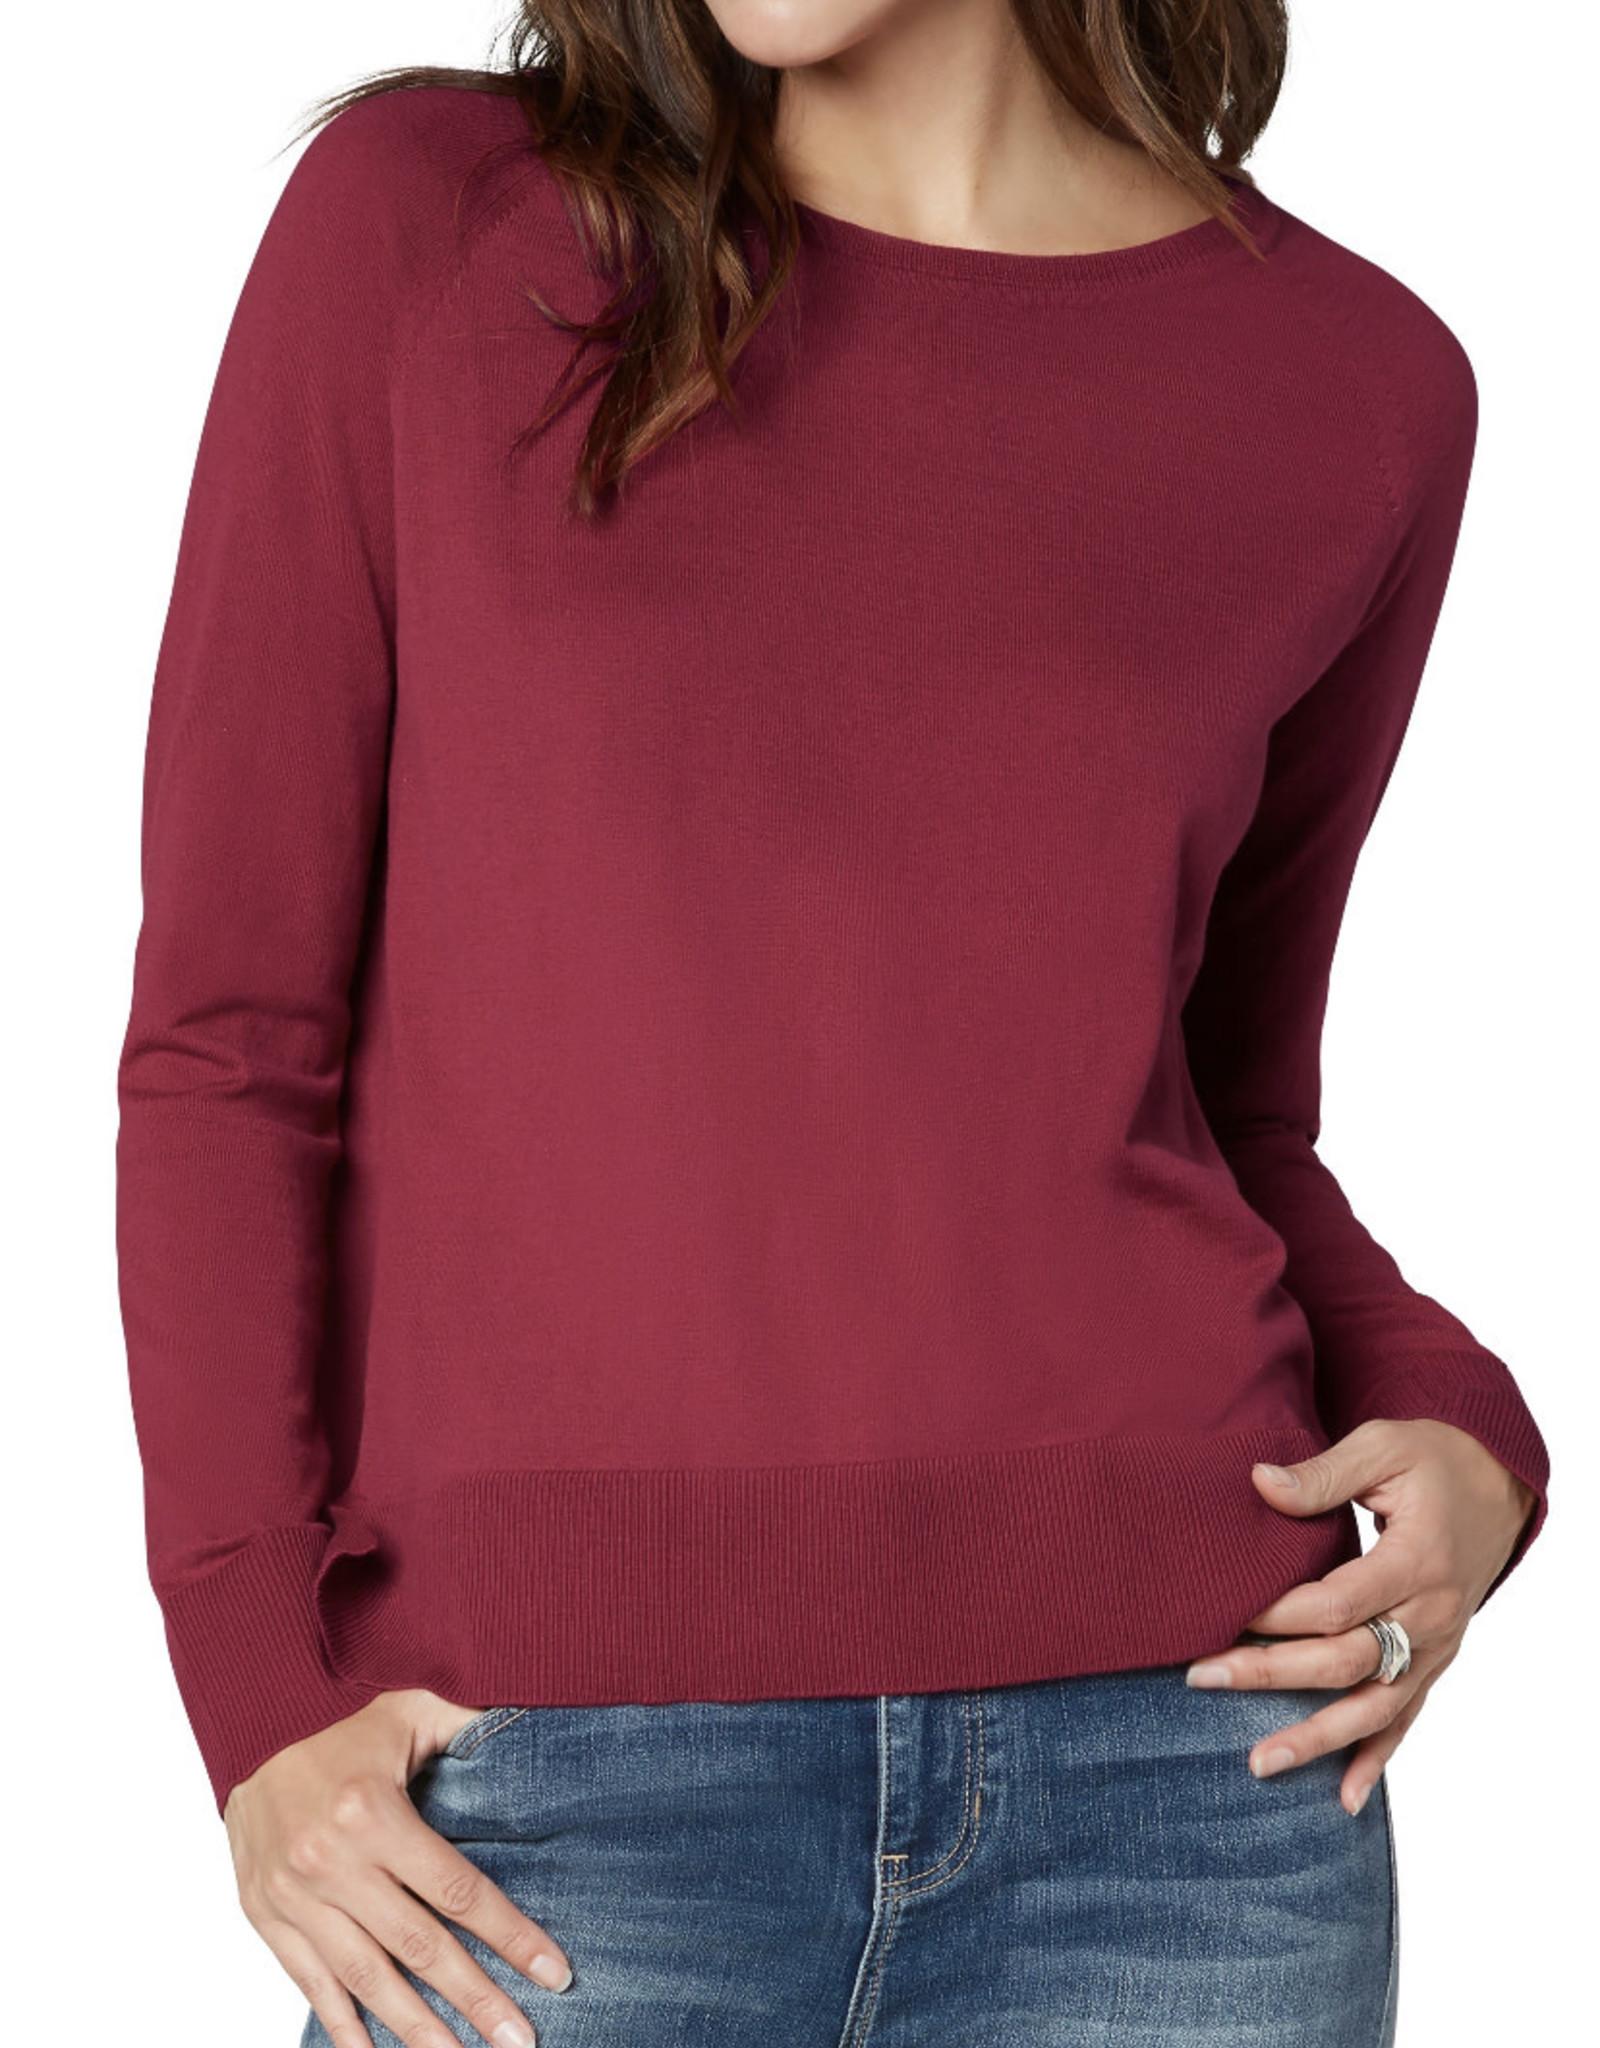 Liverpool Raglan Sweater w/ side slit- raspberry